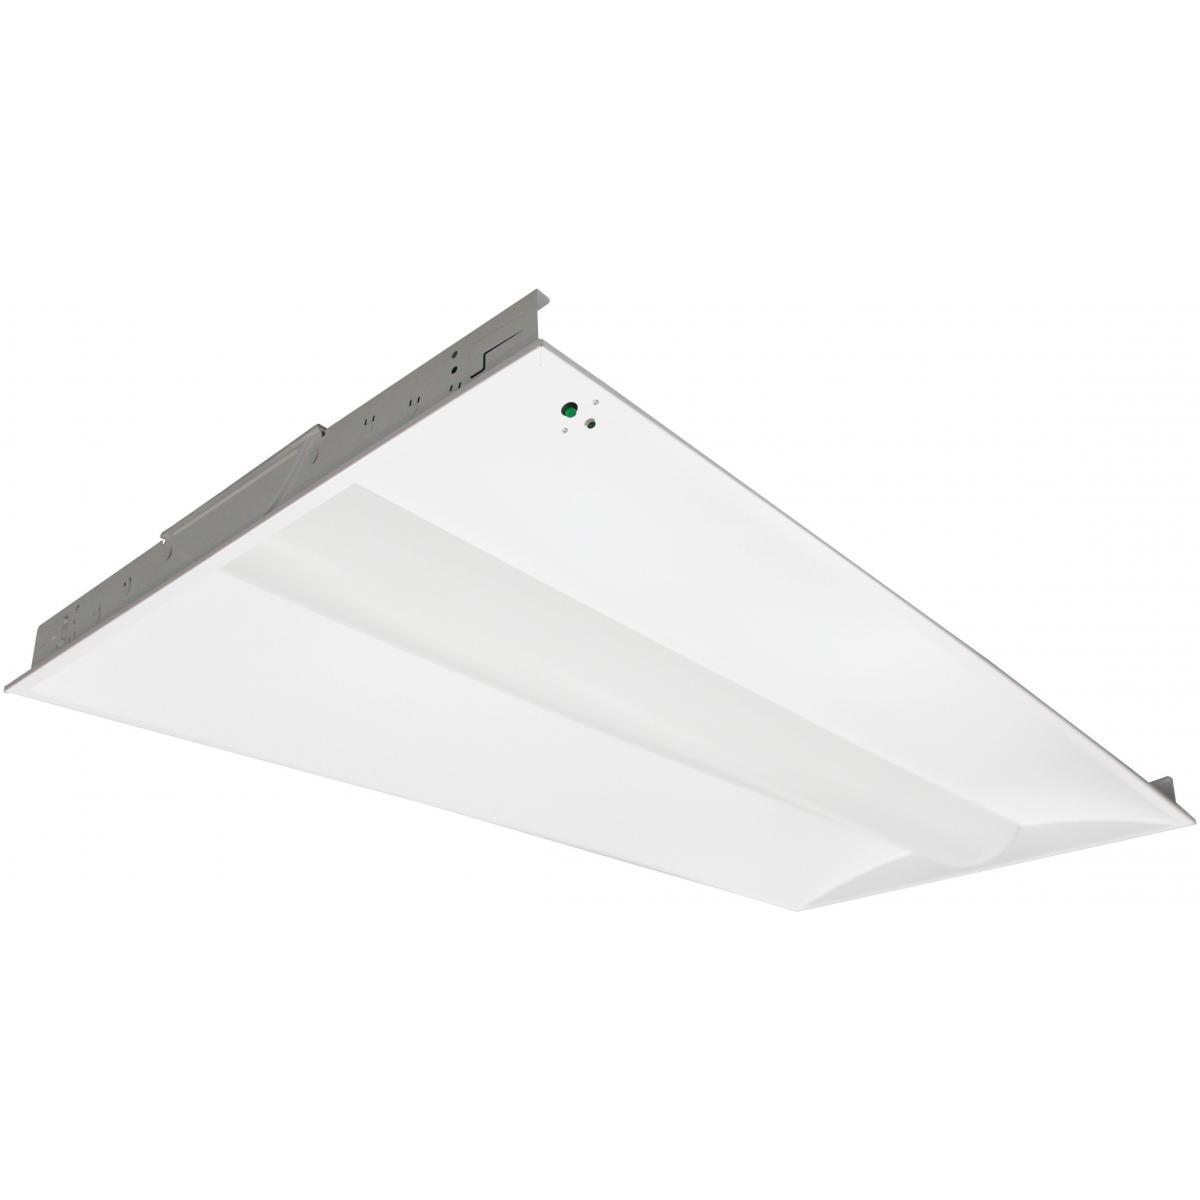 65-454 2FT X 4FT EM LED TROFFER 50W